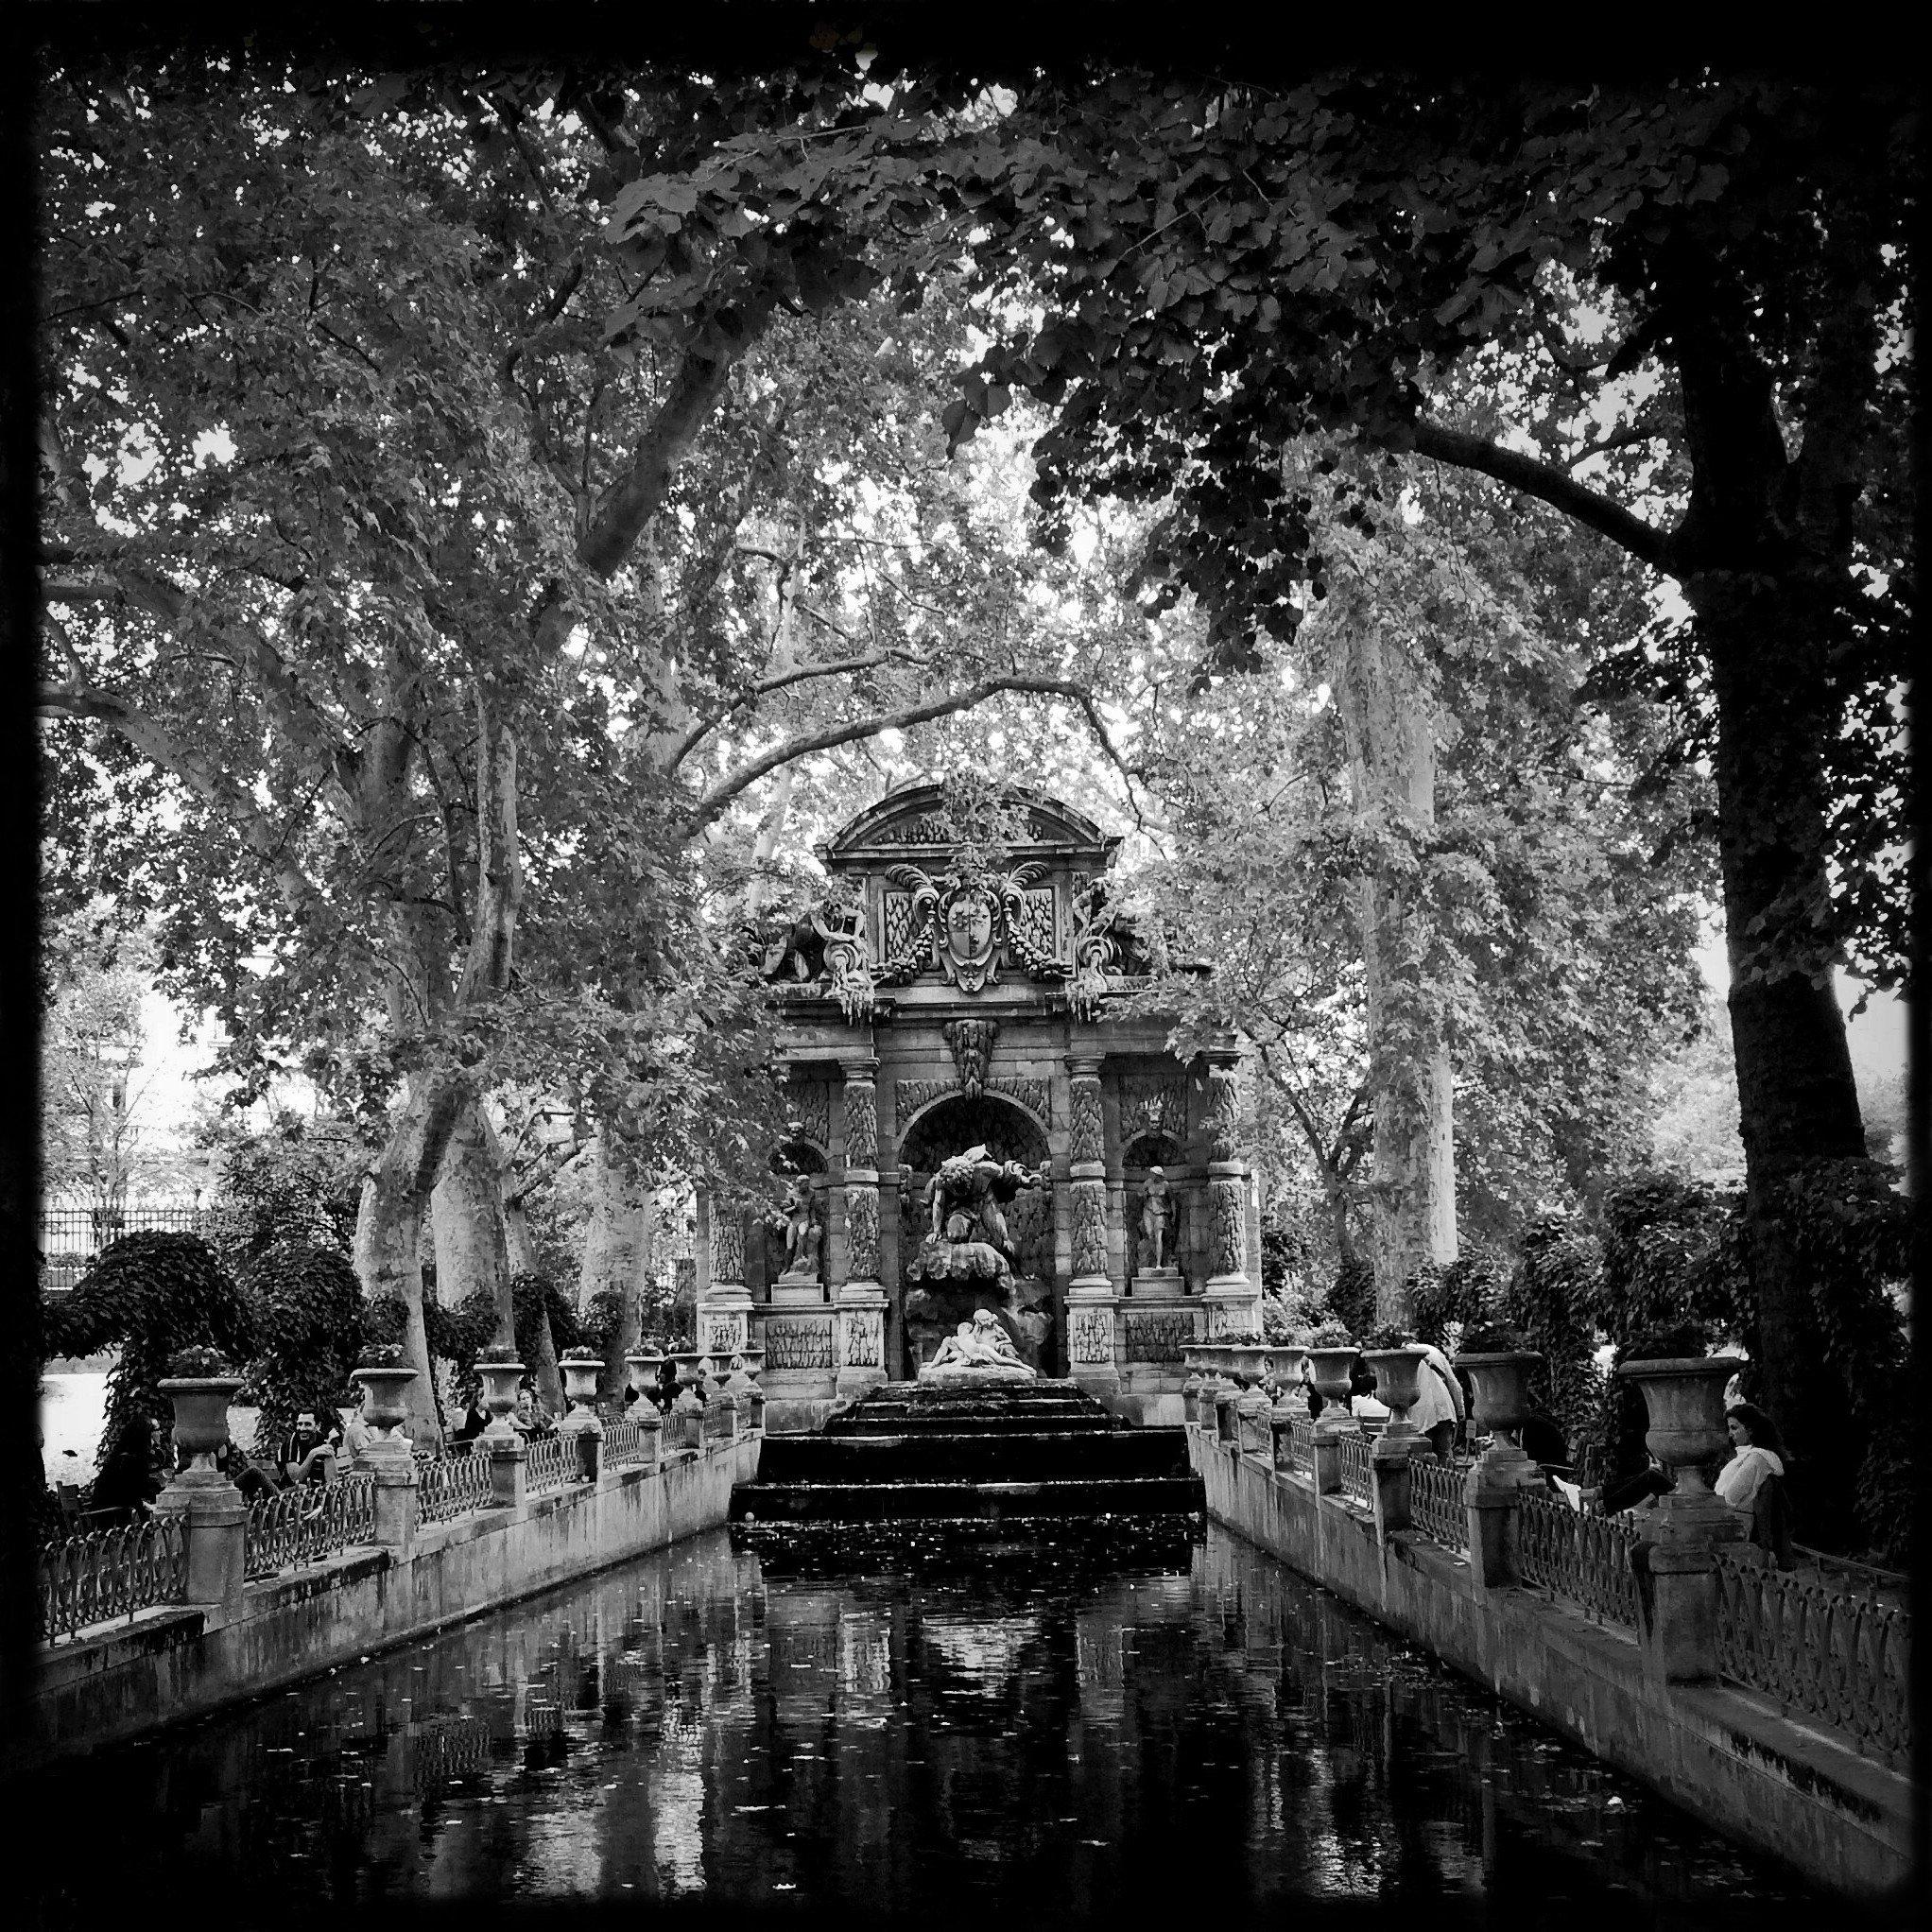 p-478-Garden_of_Good_and_EvilKM